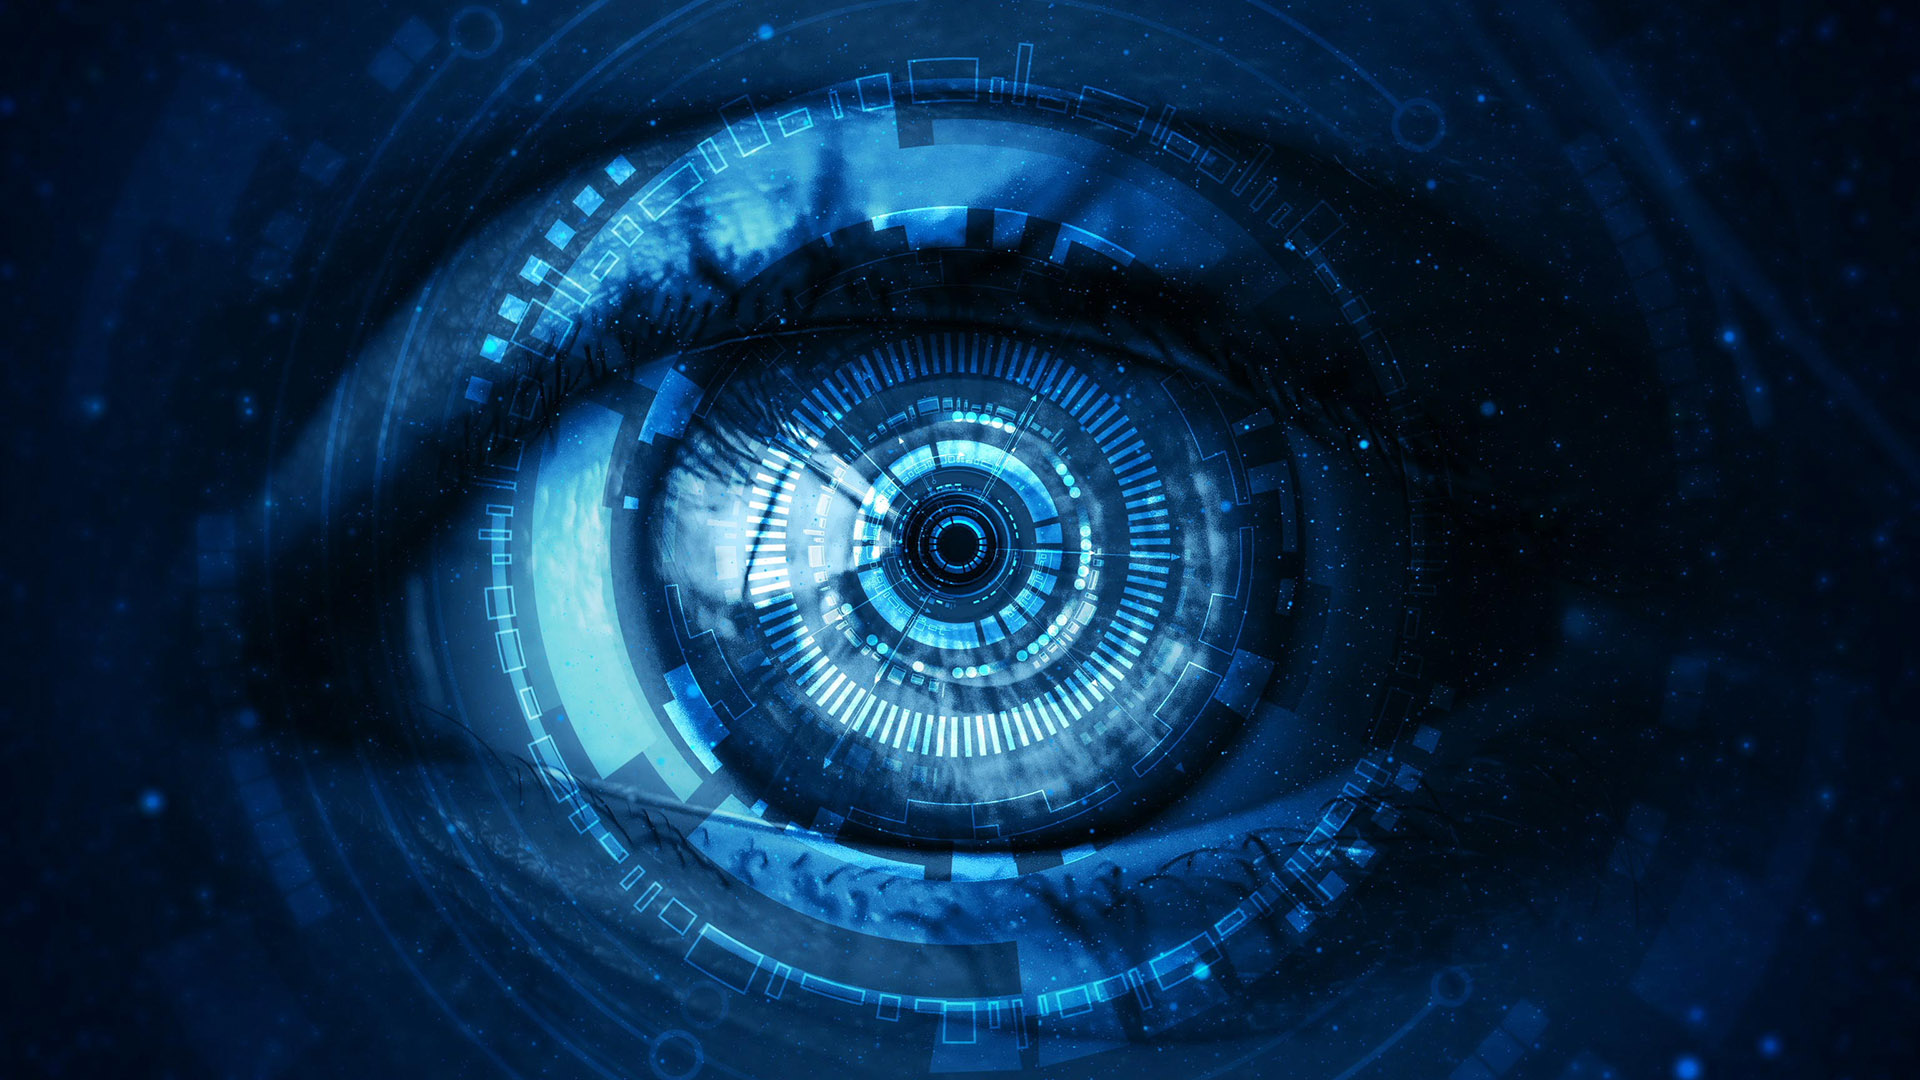 ایتالیا آژانس امنیت سایبری تاسیس میکند